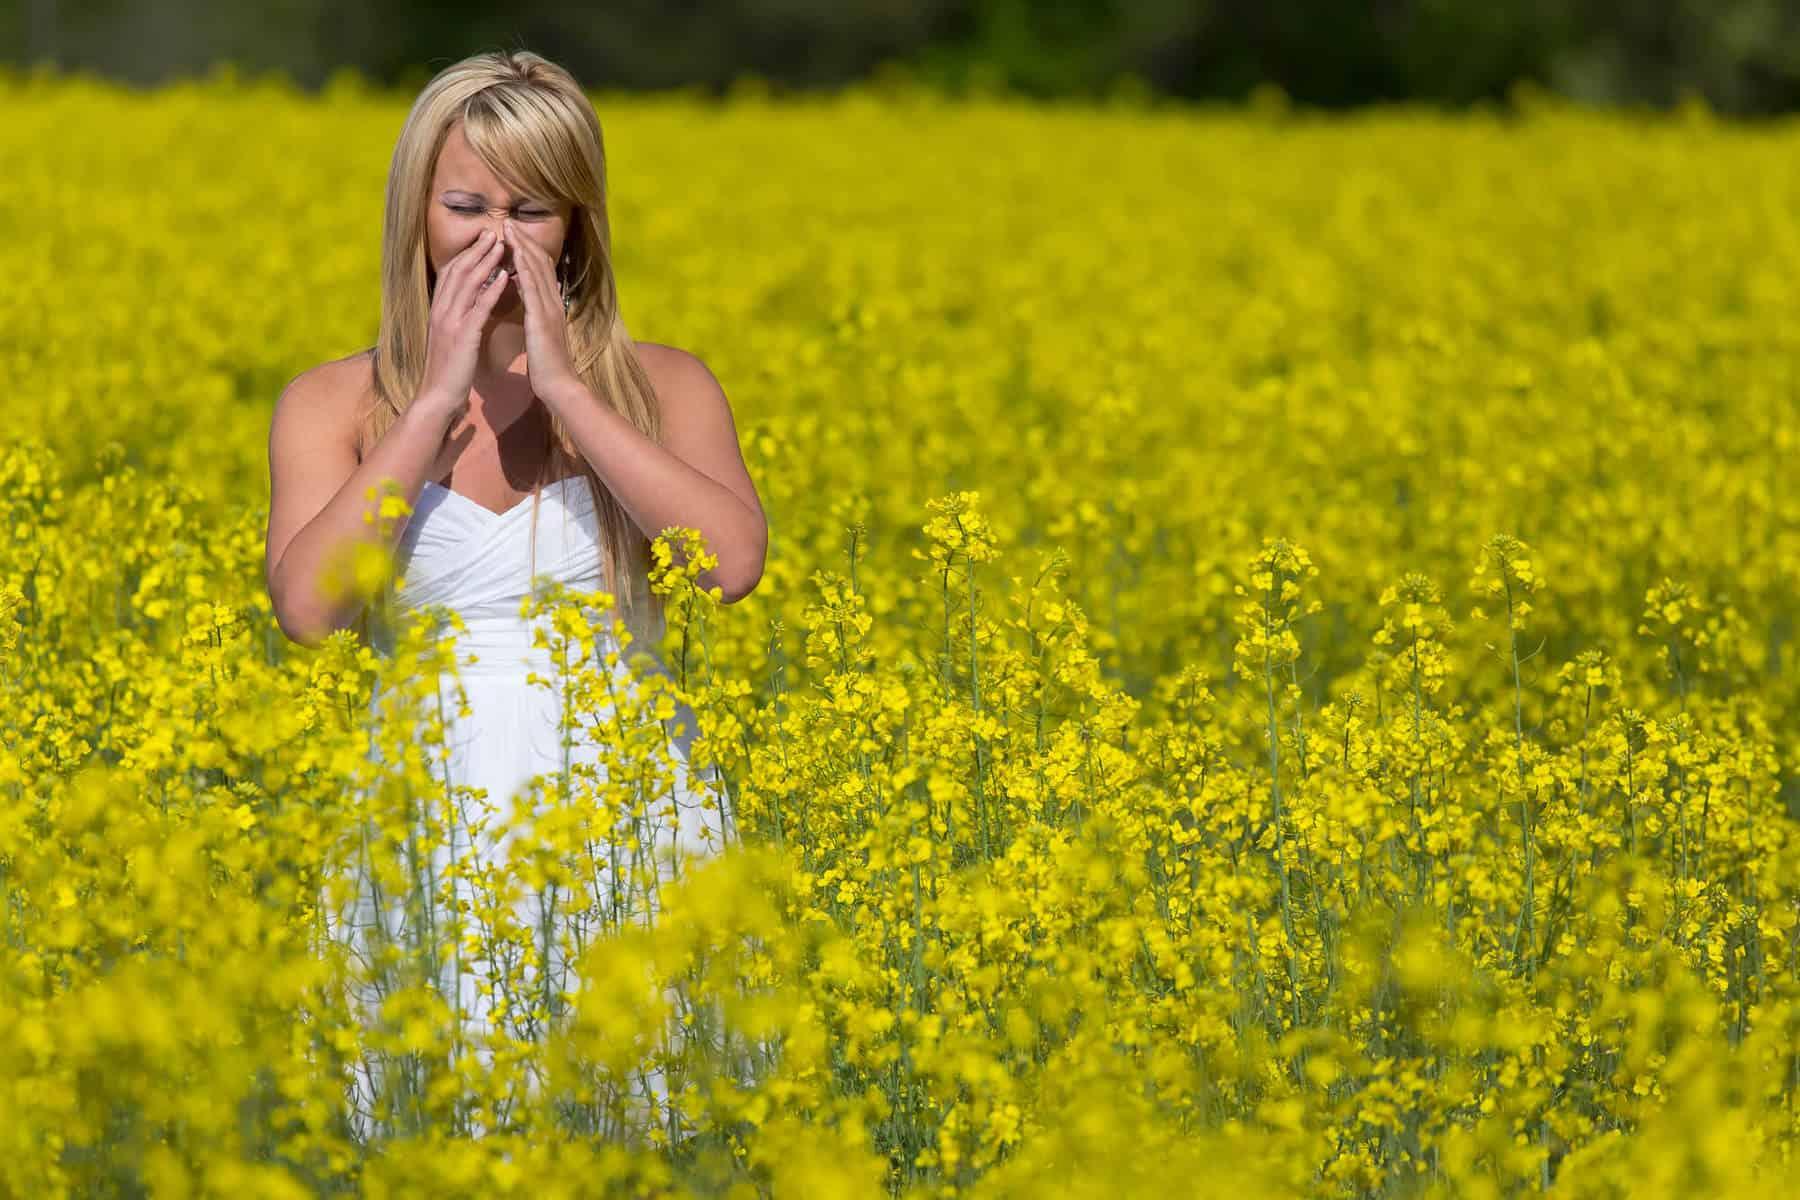 Sinus or allergy relief